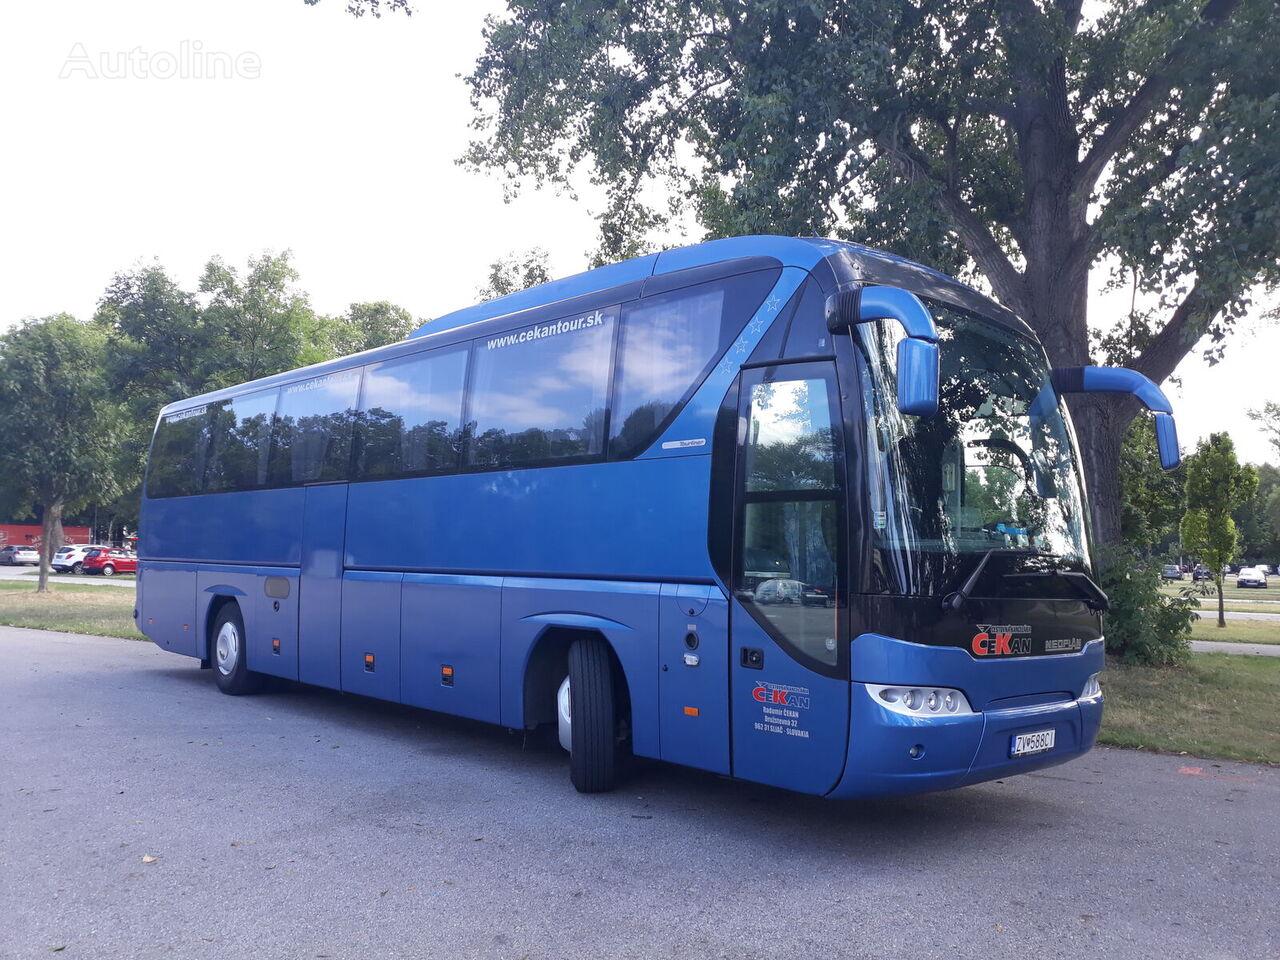 NEOPLAN Tourliner coach bus